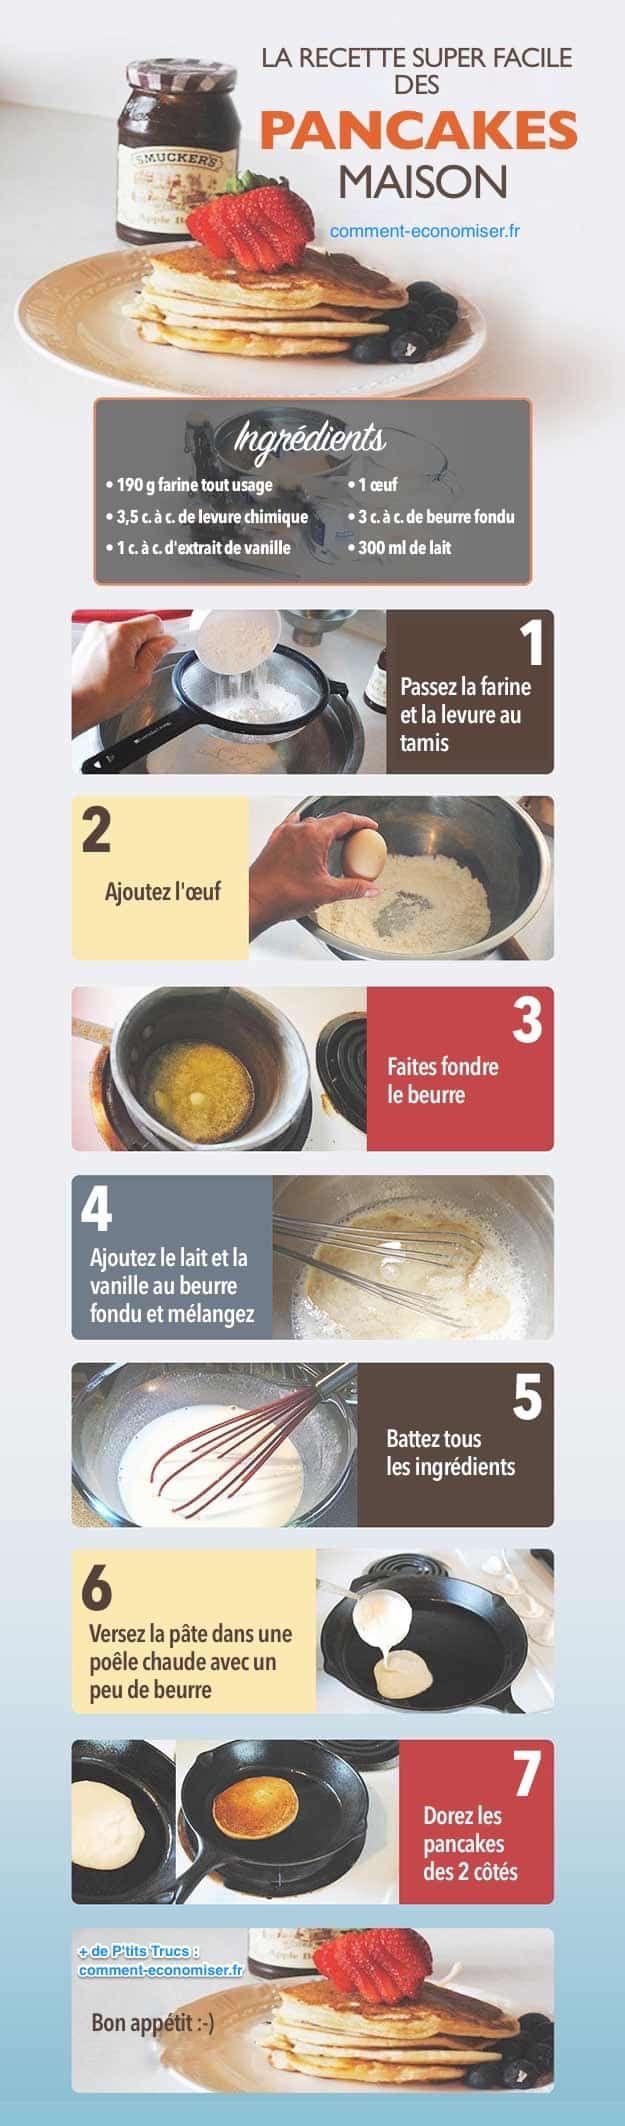 facile guida per rendere frittelle fatte in casa